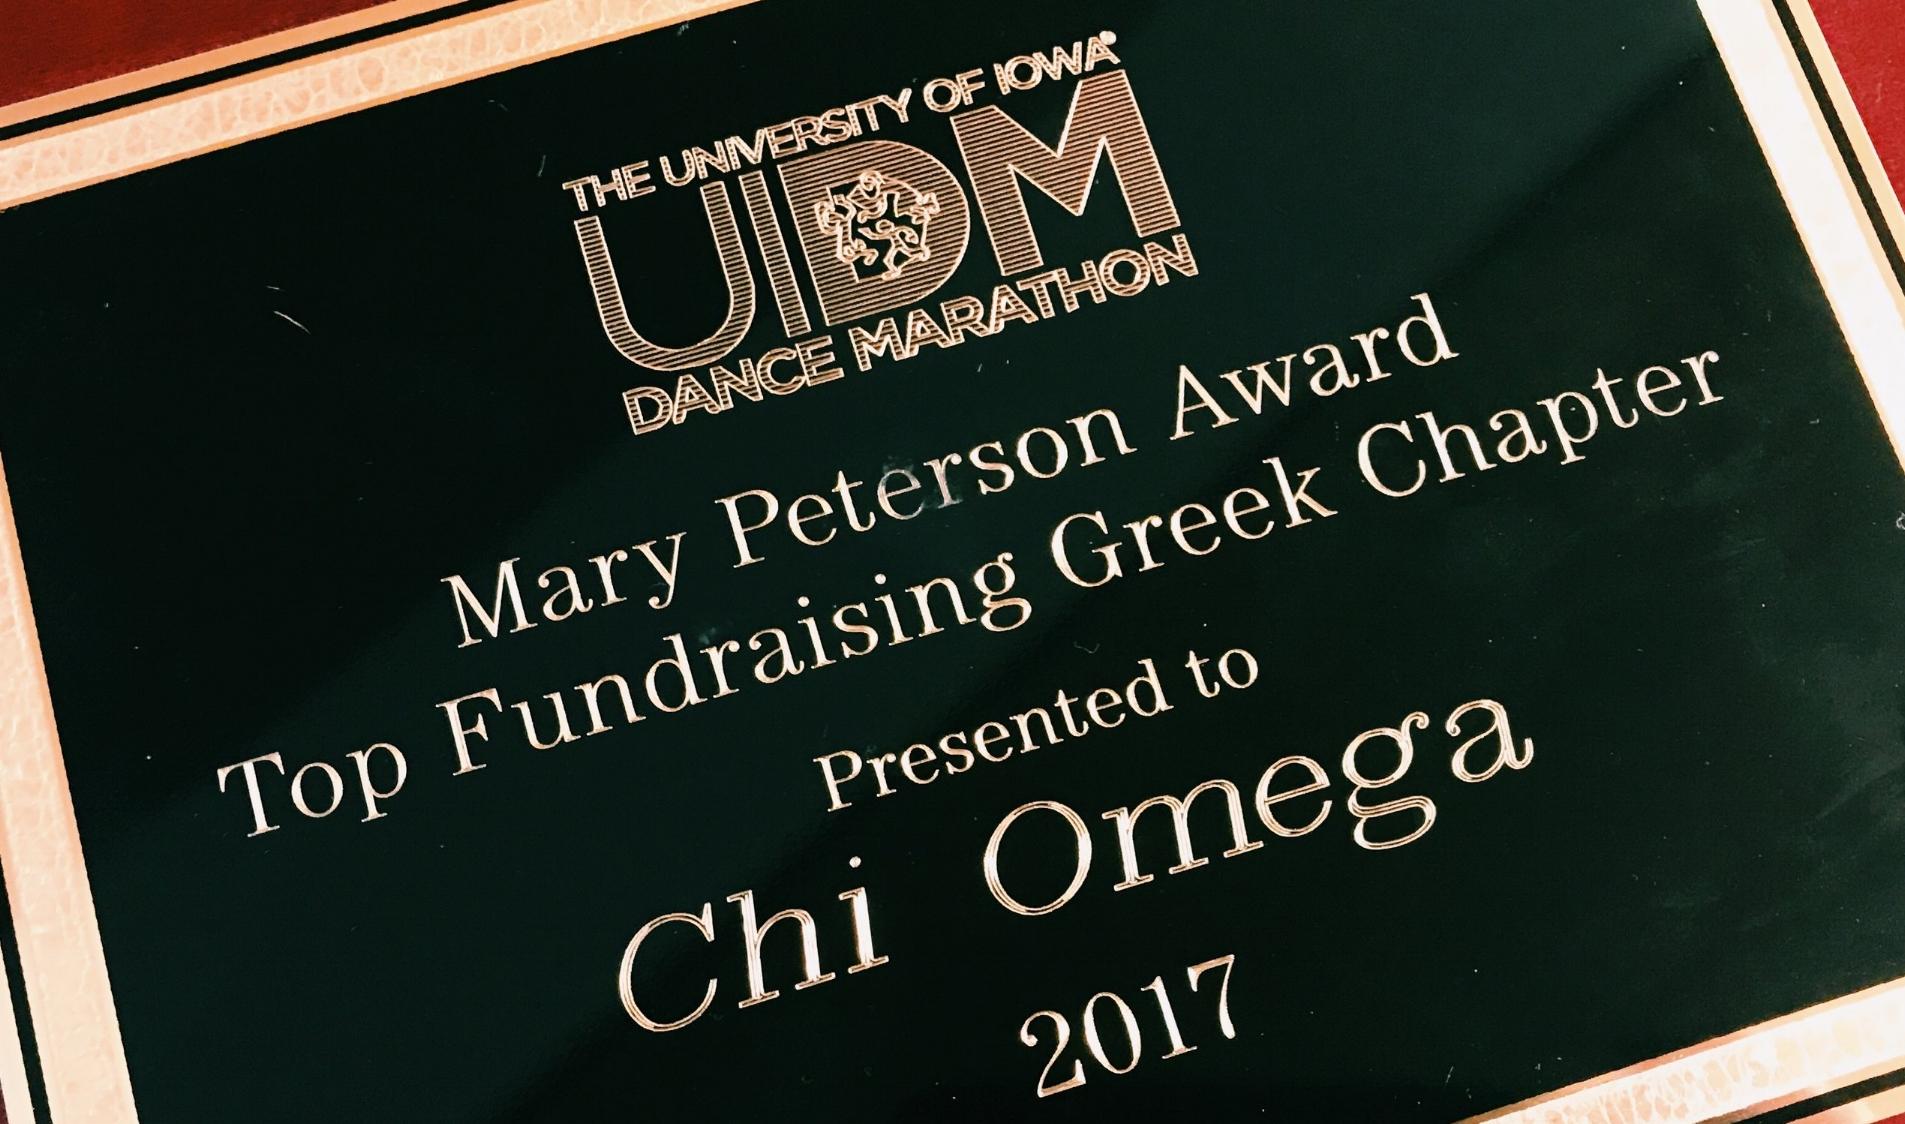 chi_omega_dance_marathon_iowa_top_fundraising_chapter_philanthropy_university.jpeg